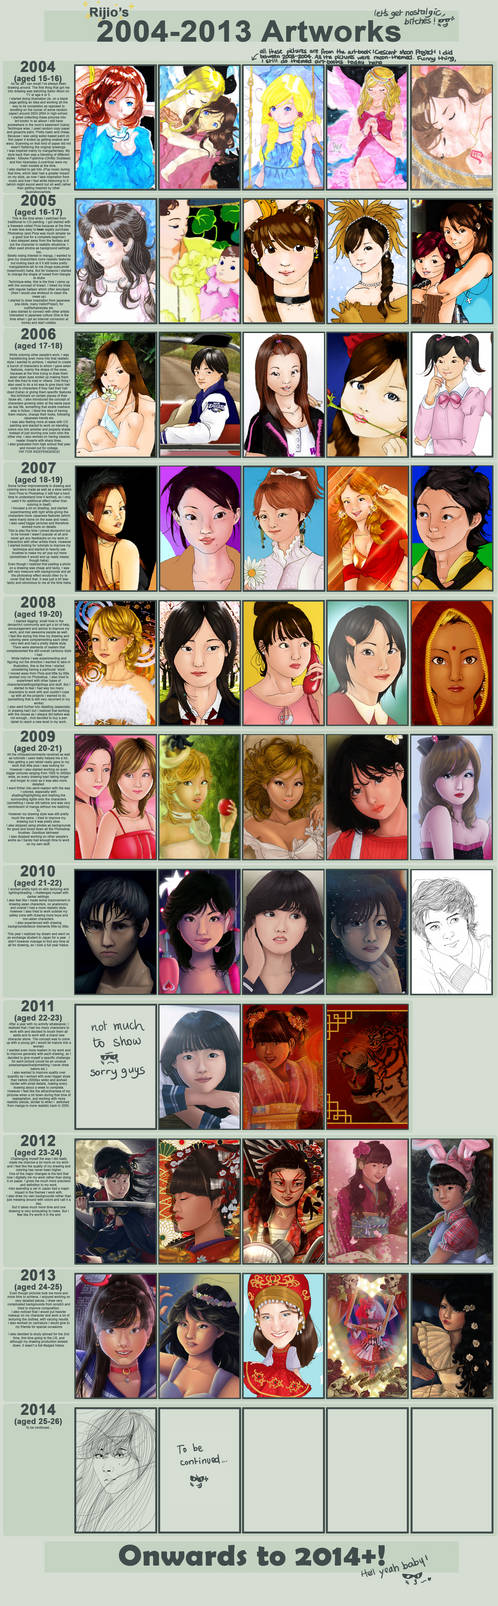 2004-2014 TEN YEARS of improvement meme by Rijio